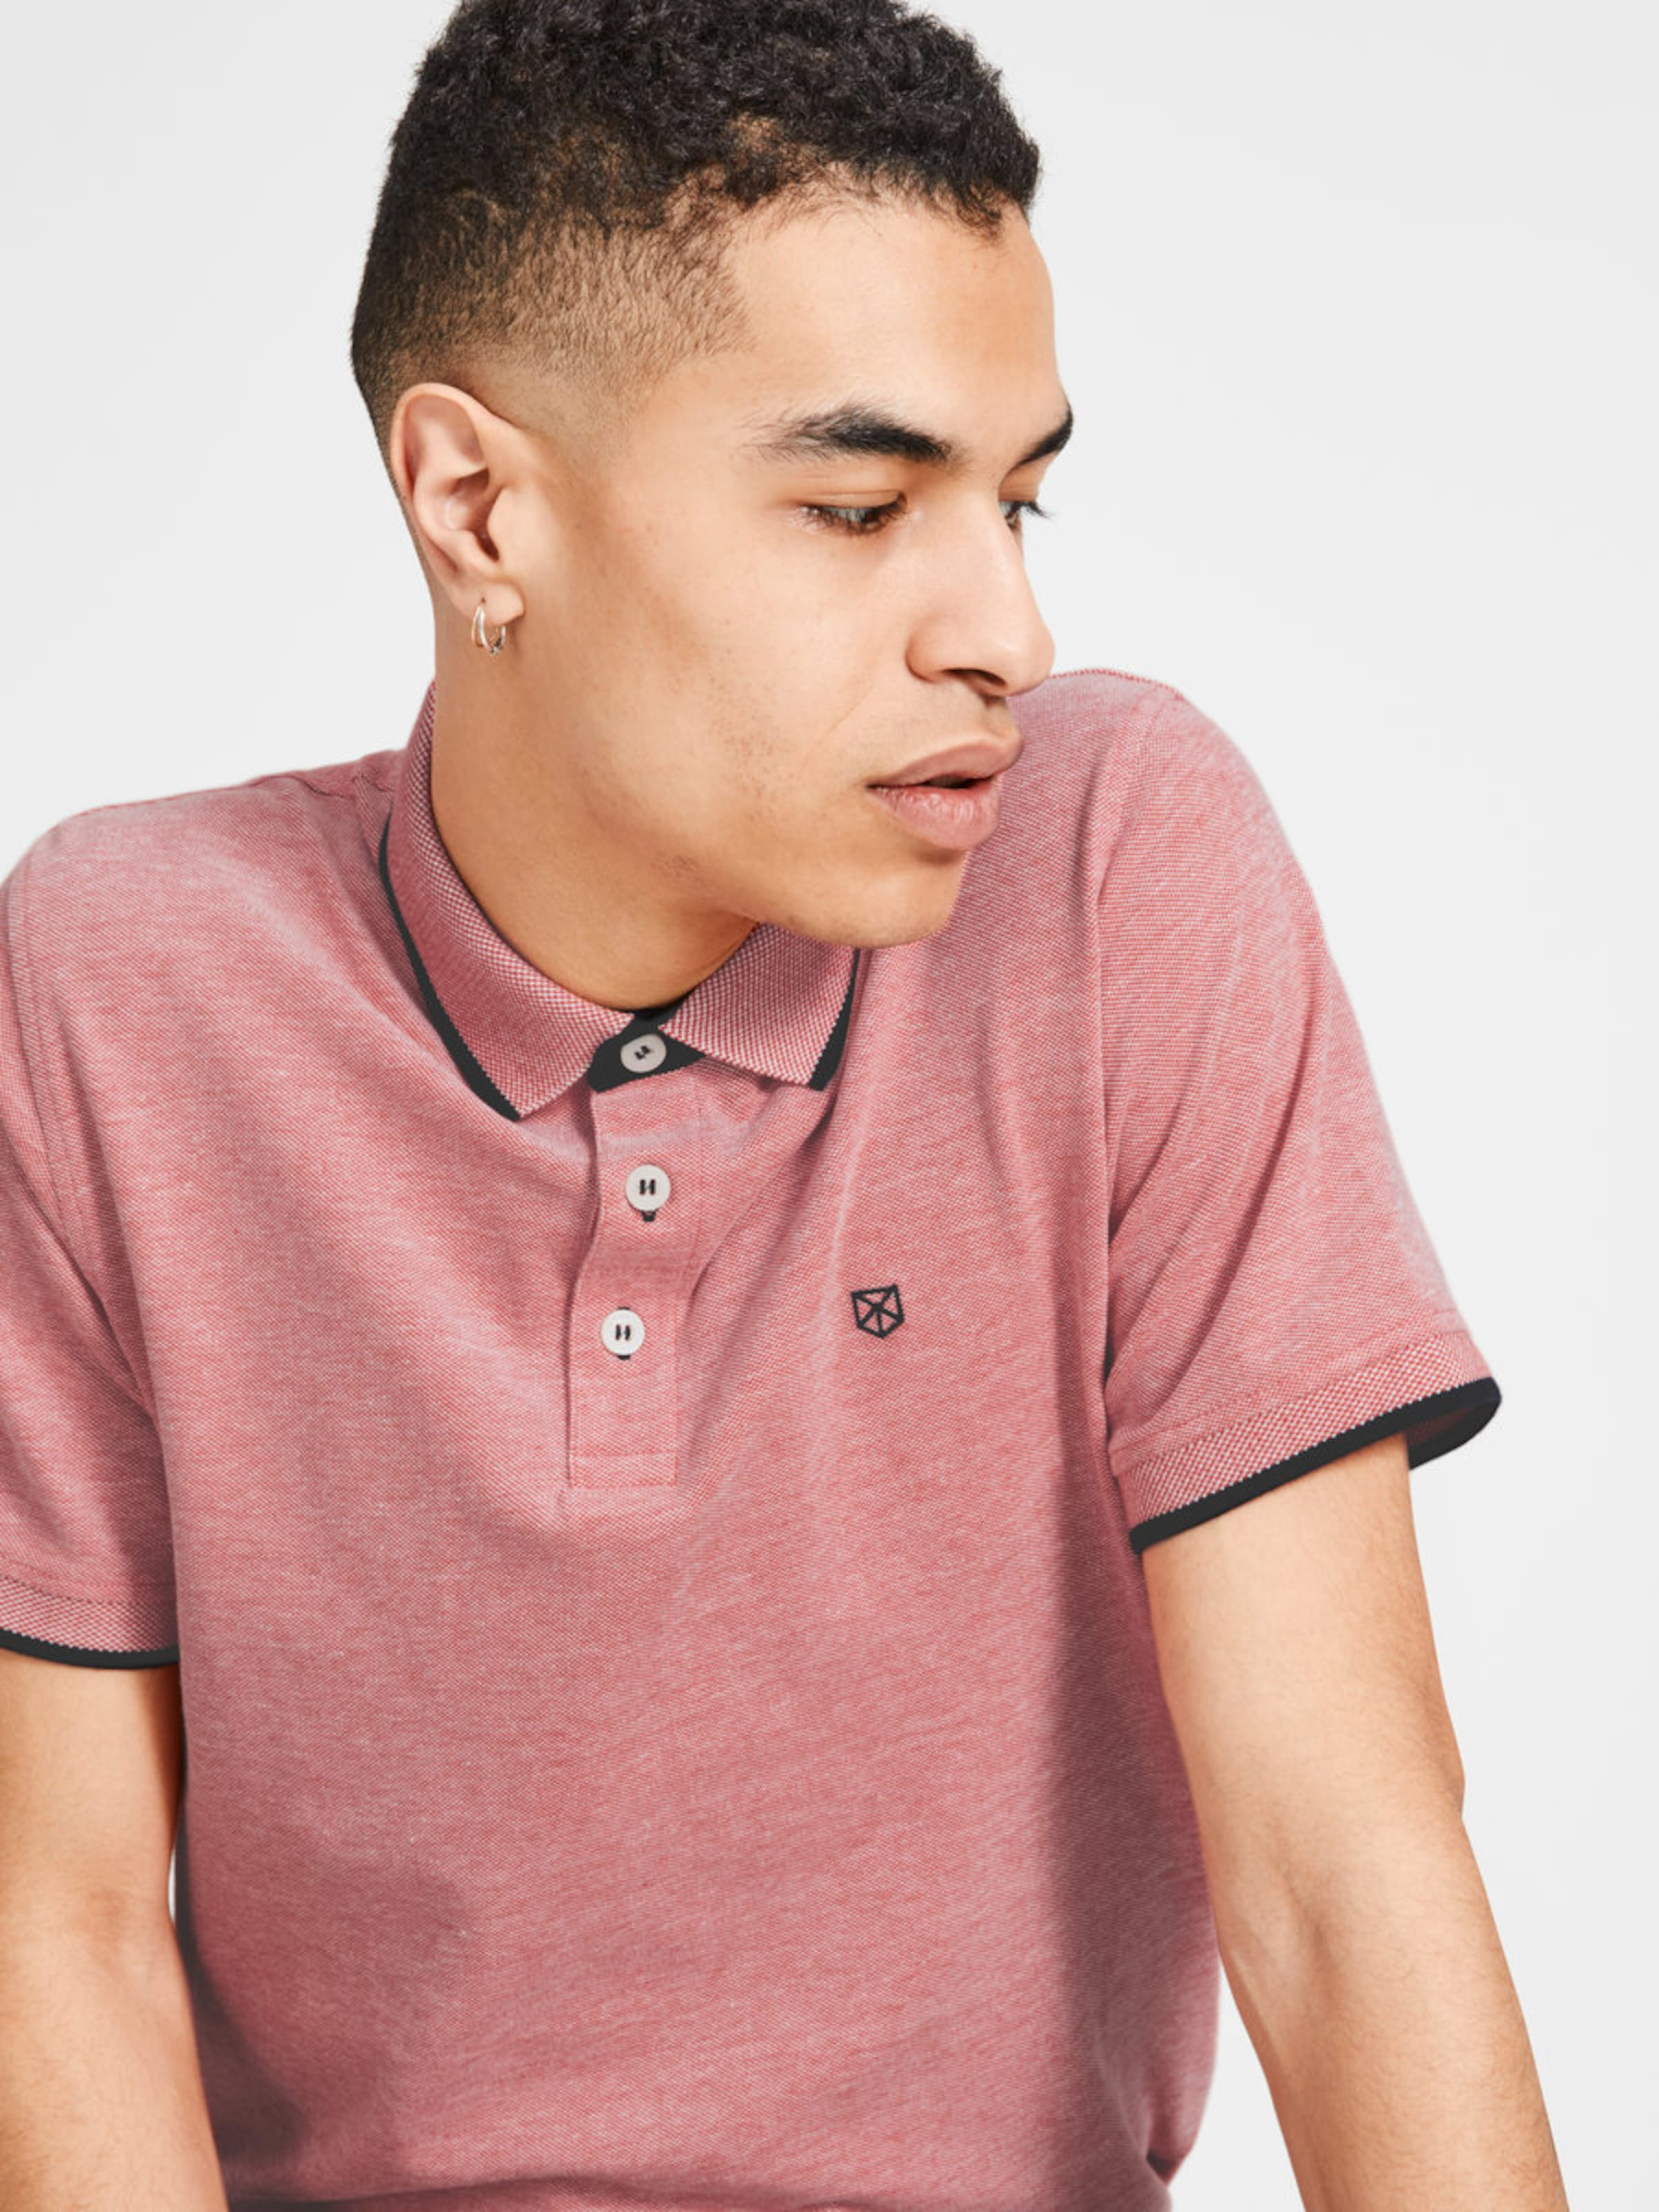 'jprpaulos shirt Noos' Jackamp; Ss En Rouge Jones T PastelNoir FlKuT35Jc1